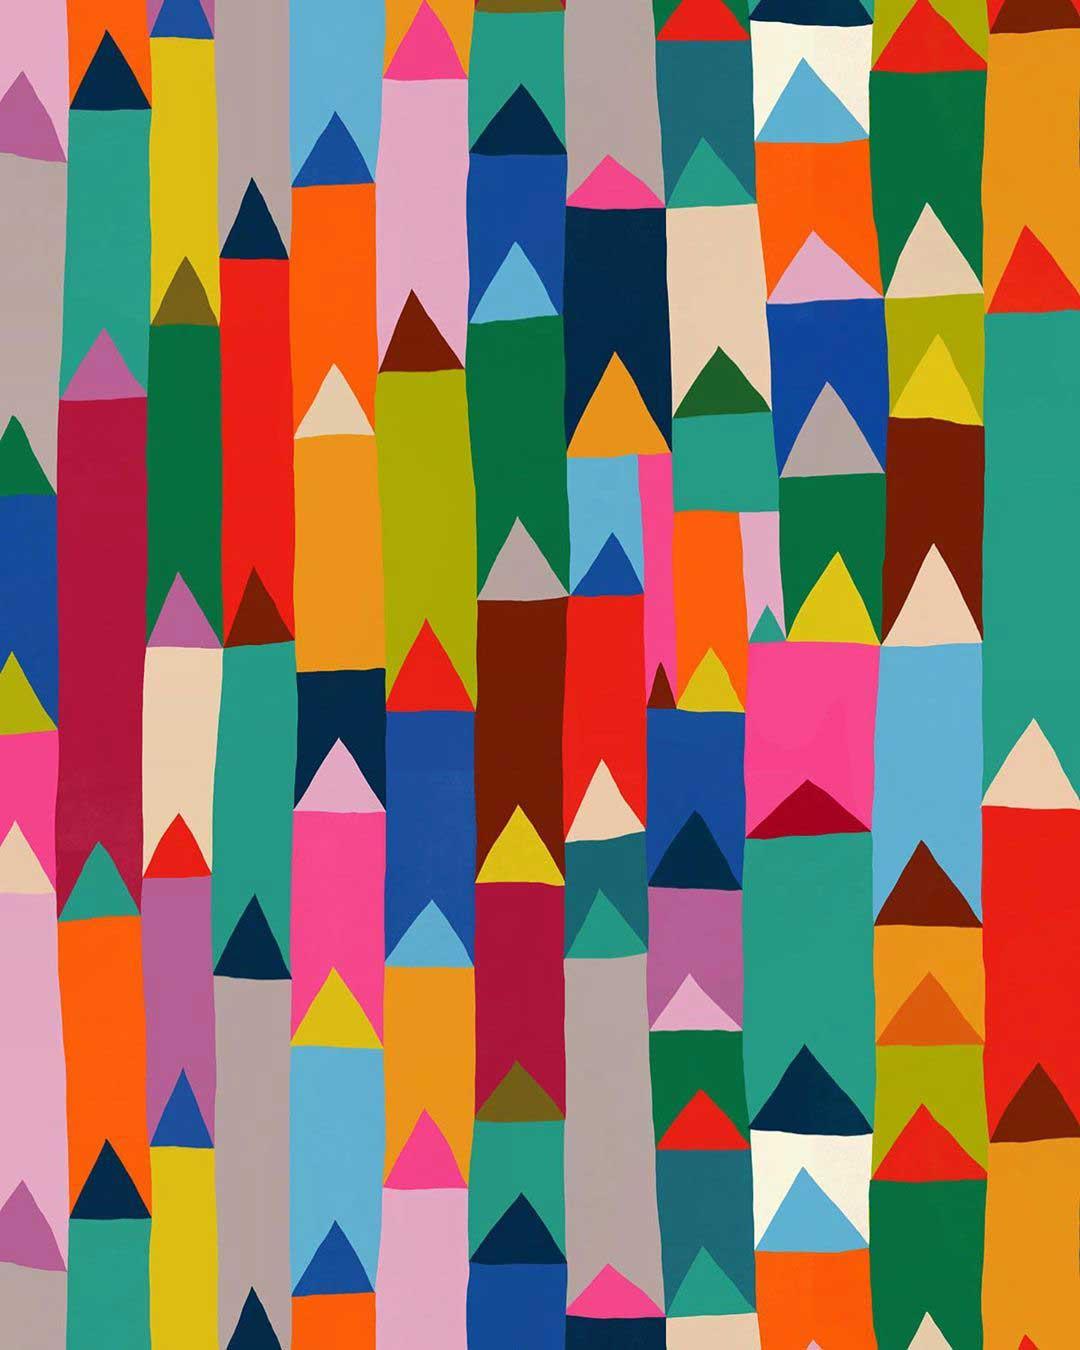 colorful pen pattern design